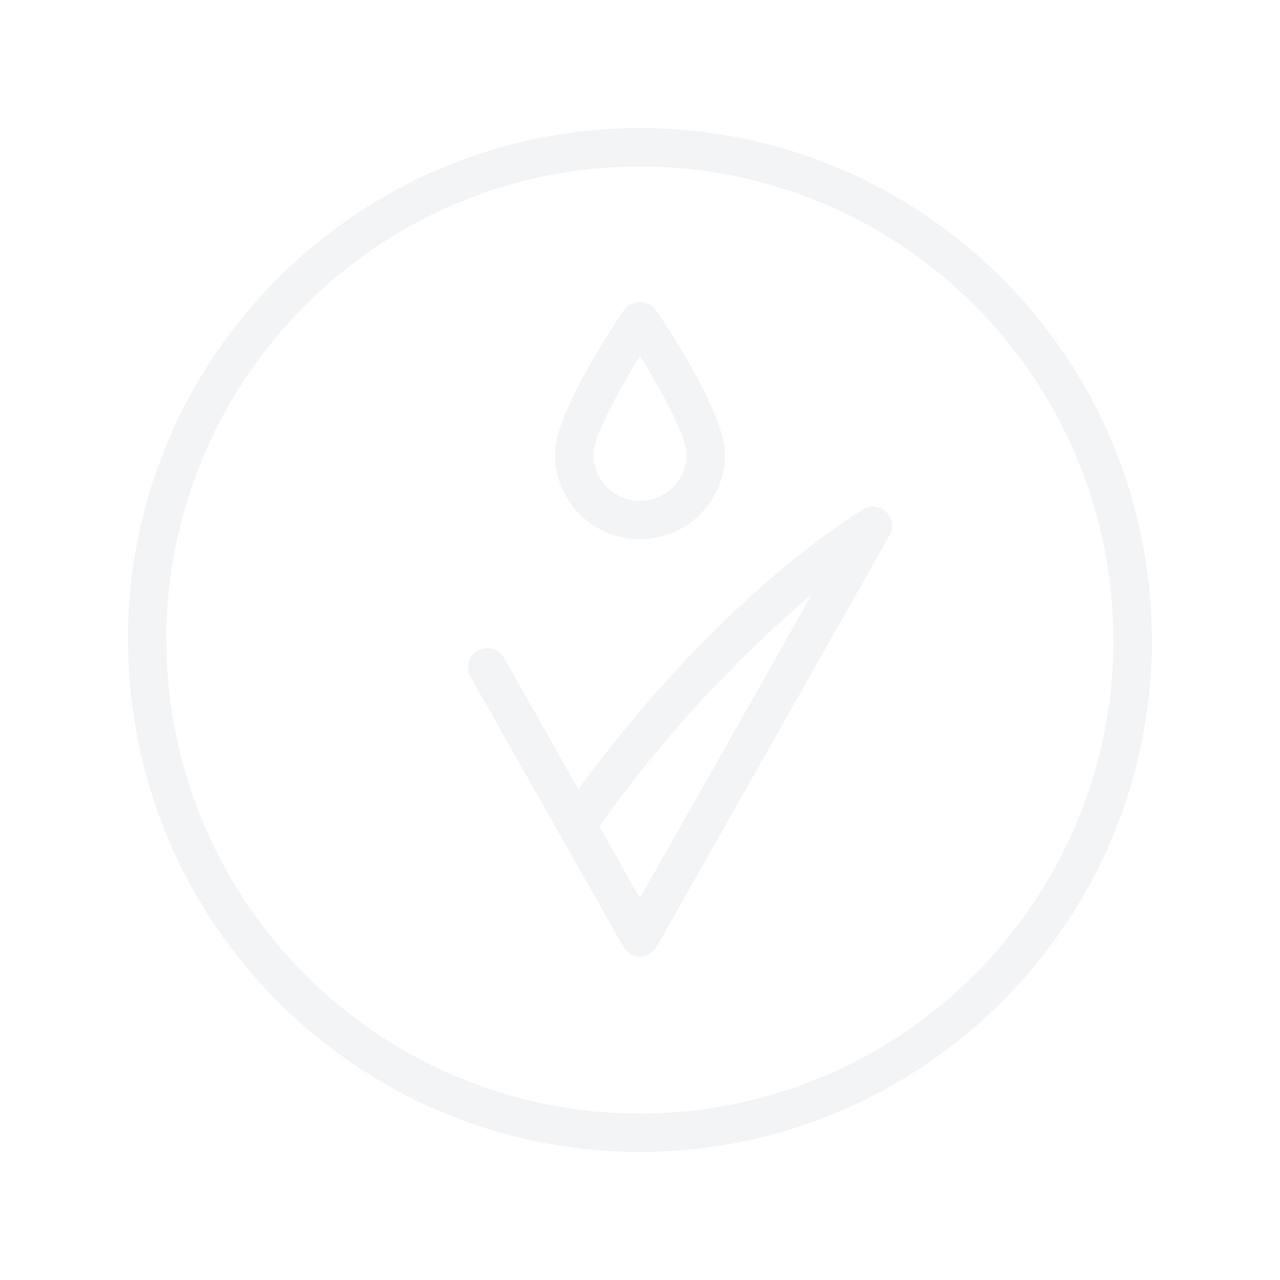 TONYMOLY Pandas Dream Glossy Lip Crayon 1.5g